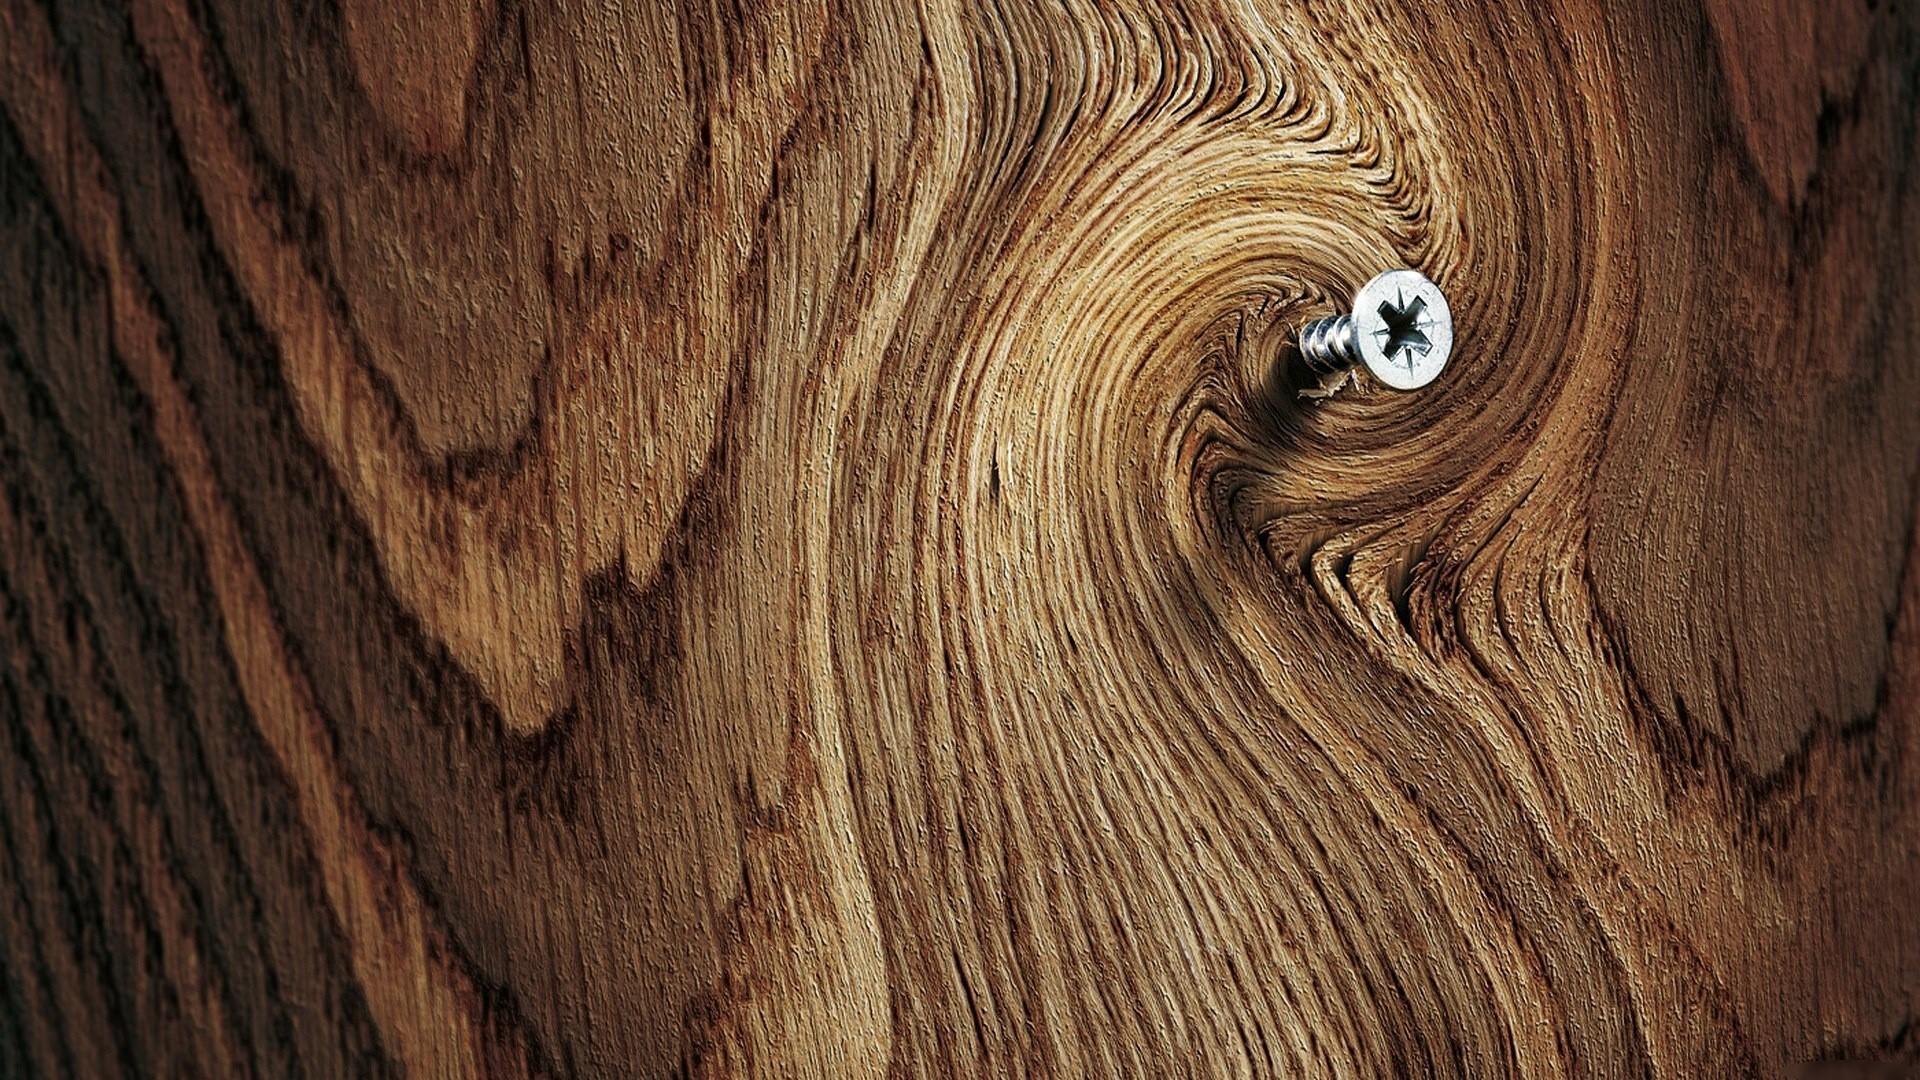 hd wood grain wallpapers | pixelstalk